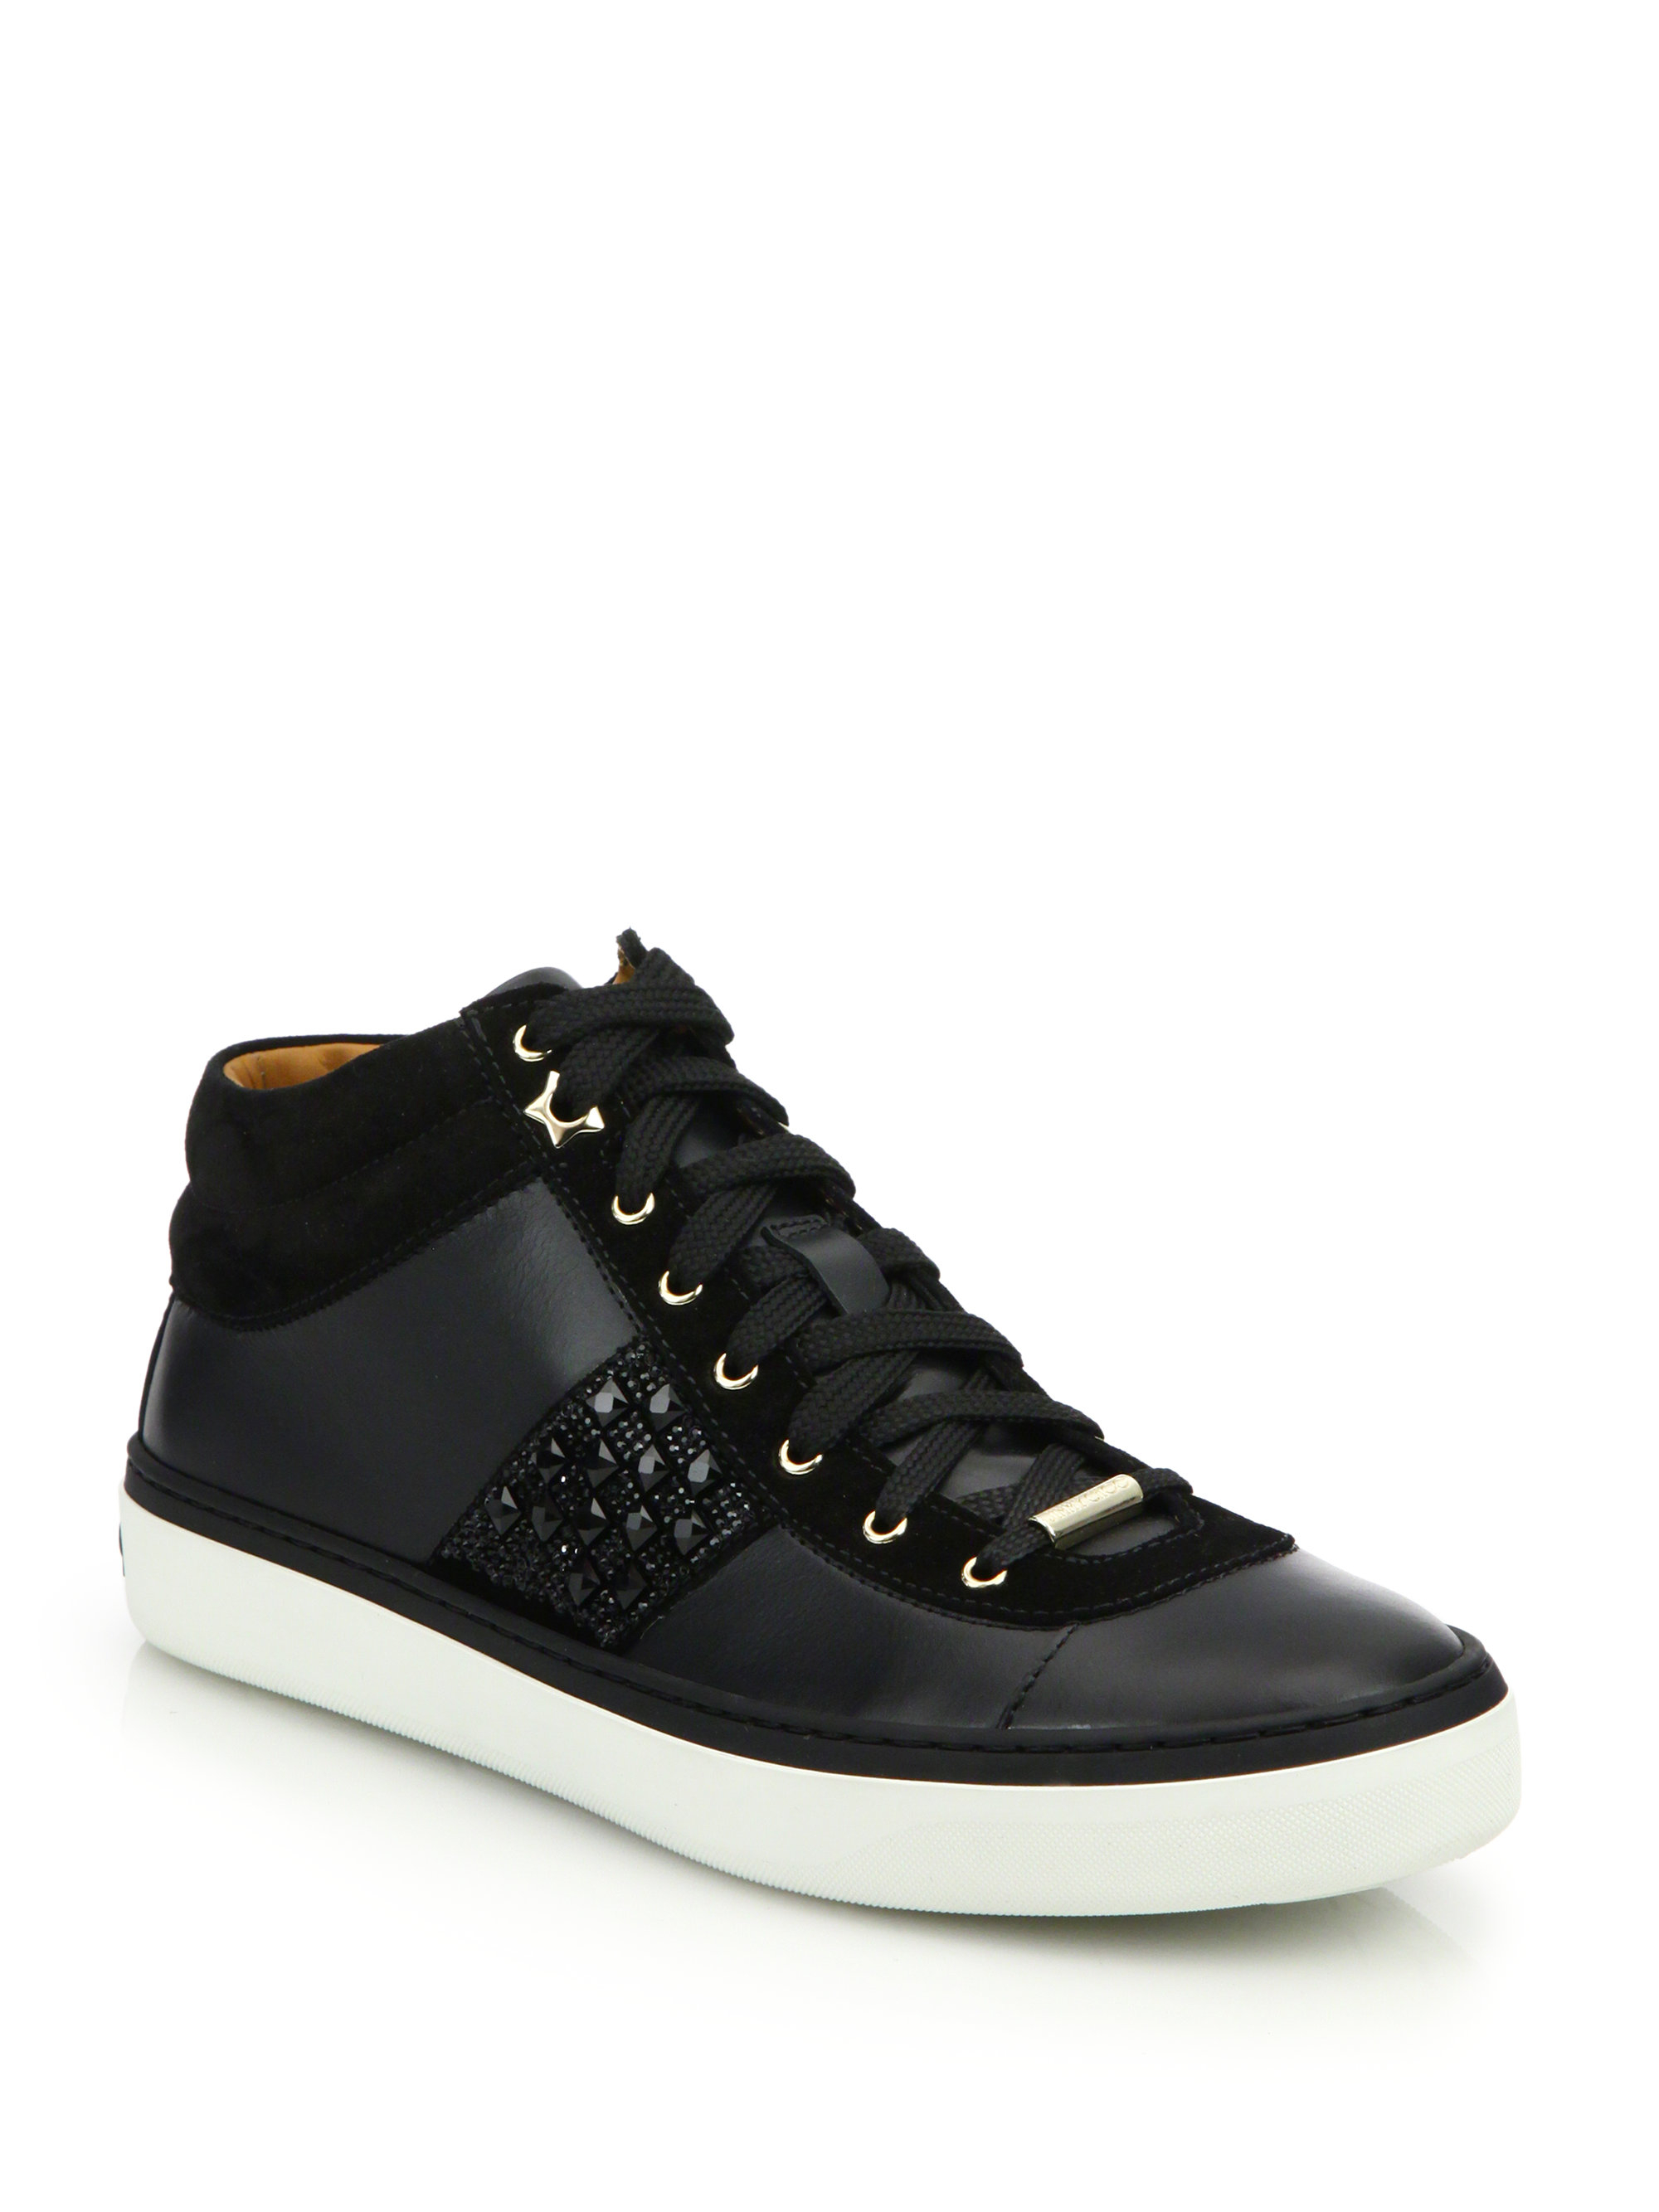 jimmy choo bells gem studded leather sneakers in black lyst. Black Bedroom Furniture Sets. Home Design Ideas